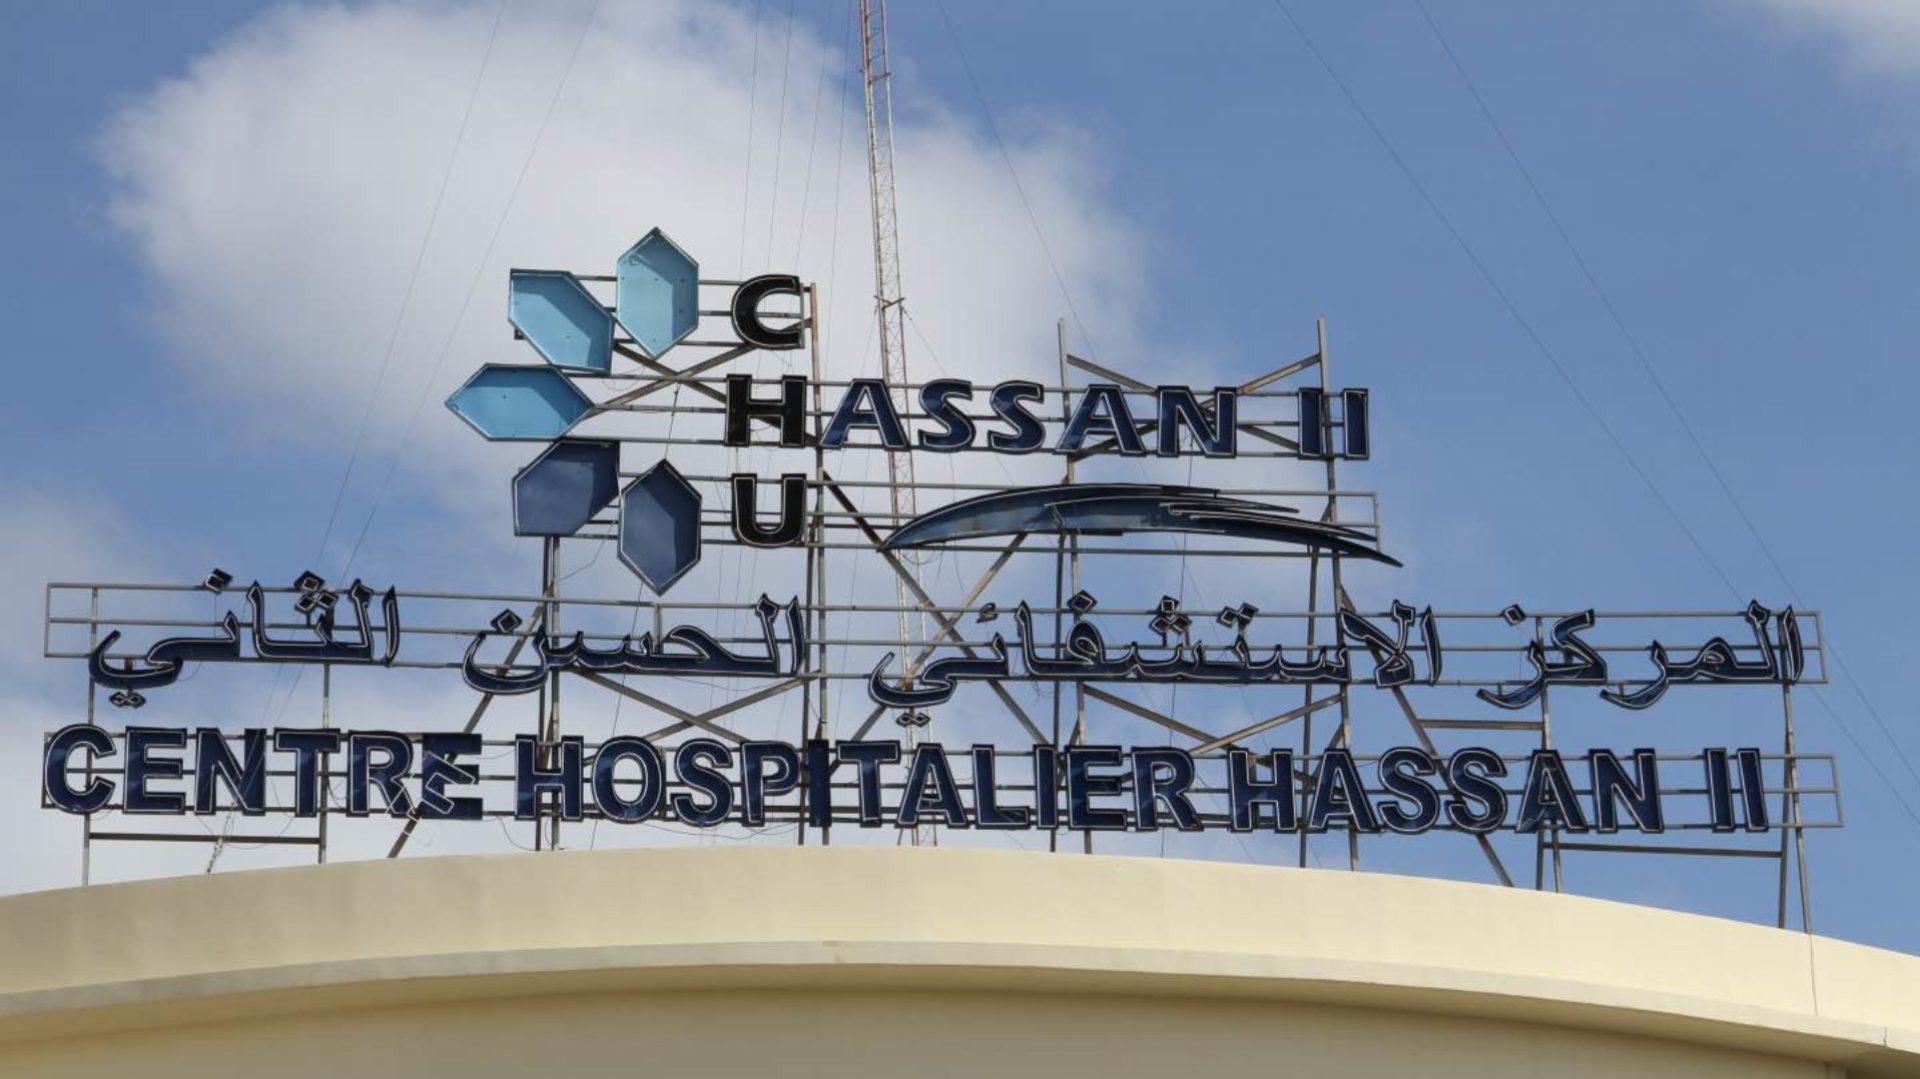 Centre Hospitalier Universitaire Hassan II